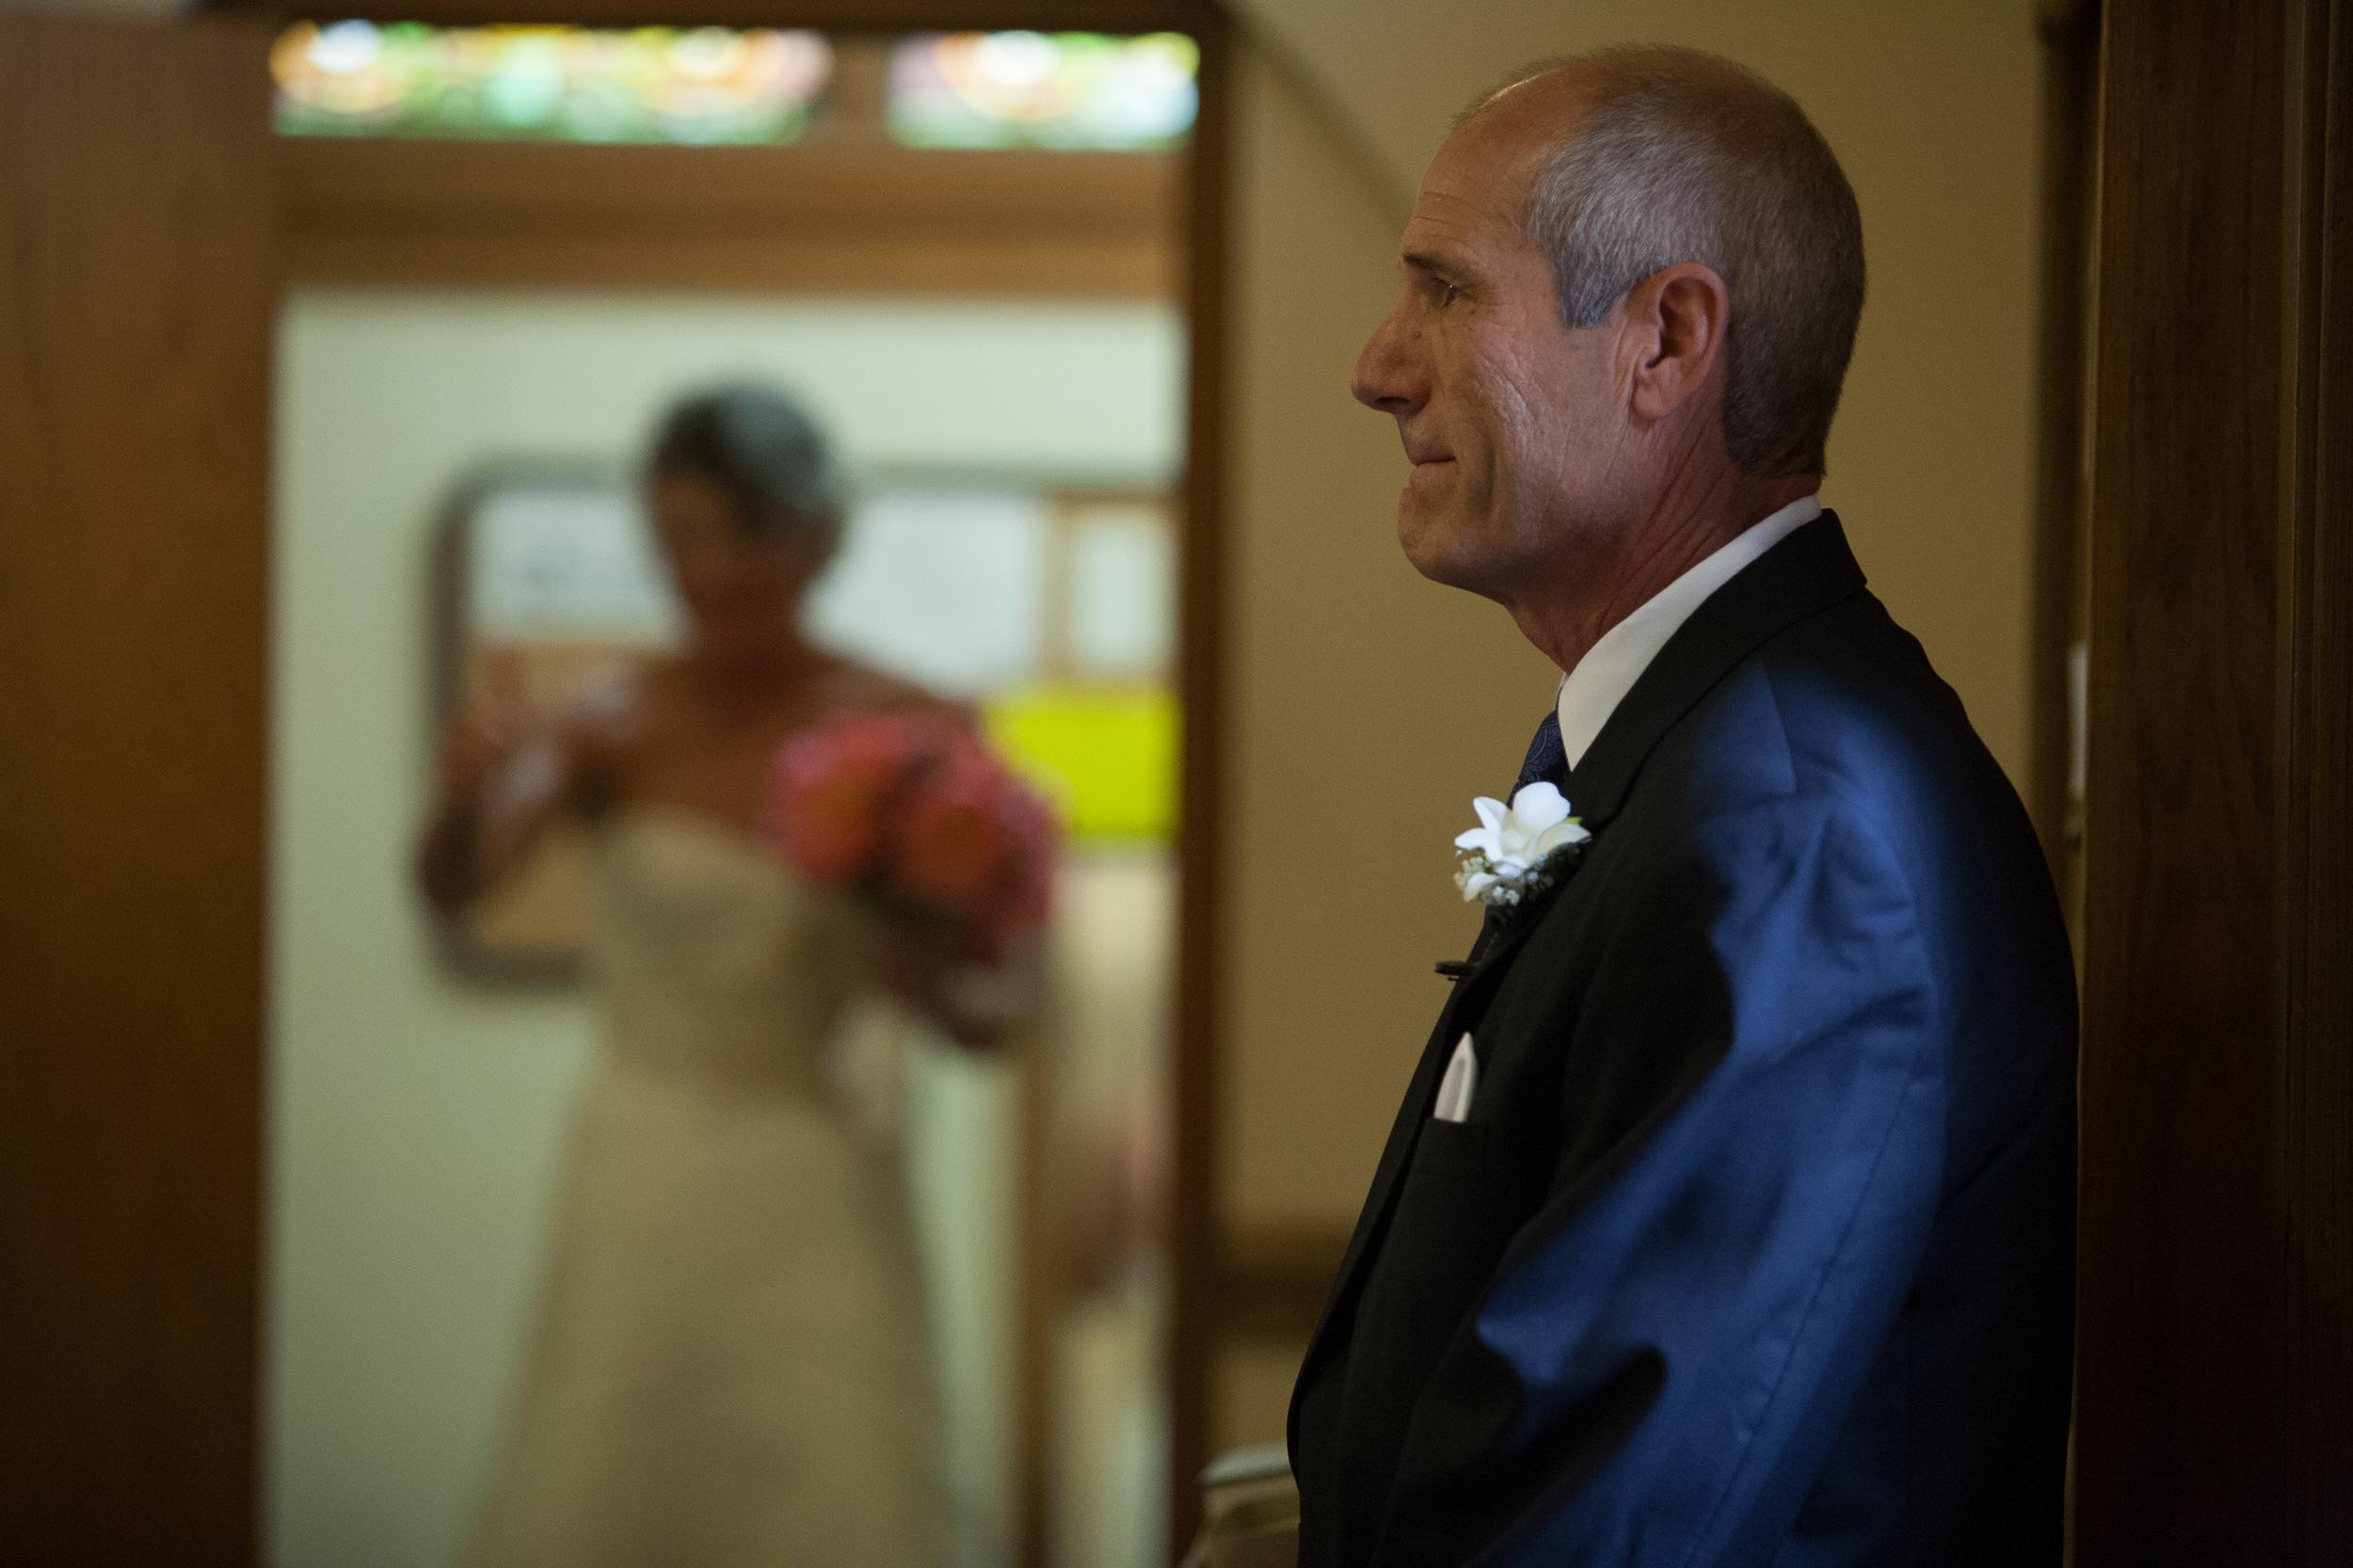 Chicago_wedding_high school_senior_photographer_beverly, wedding photographer chicago, affordable, inexpensive, creative, cutting edge, south side, south suburbs, family, kids photographer, chicagoNIU, wedding-3.jpg